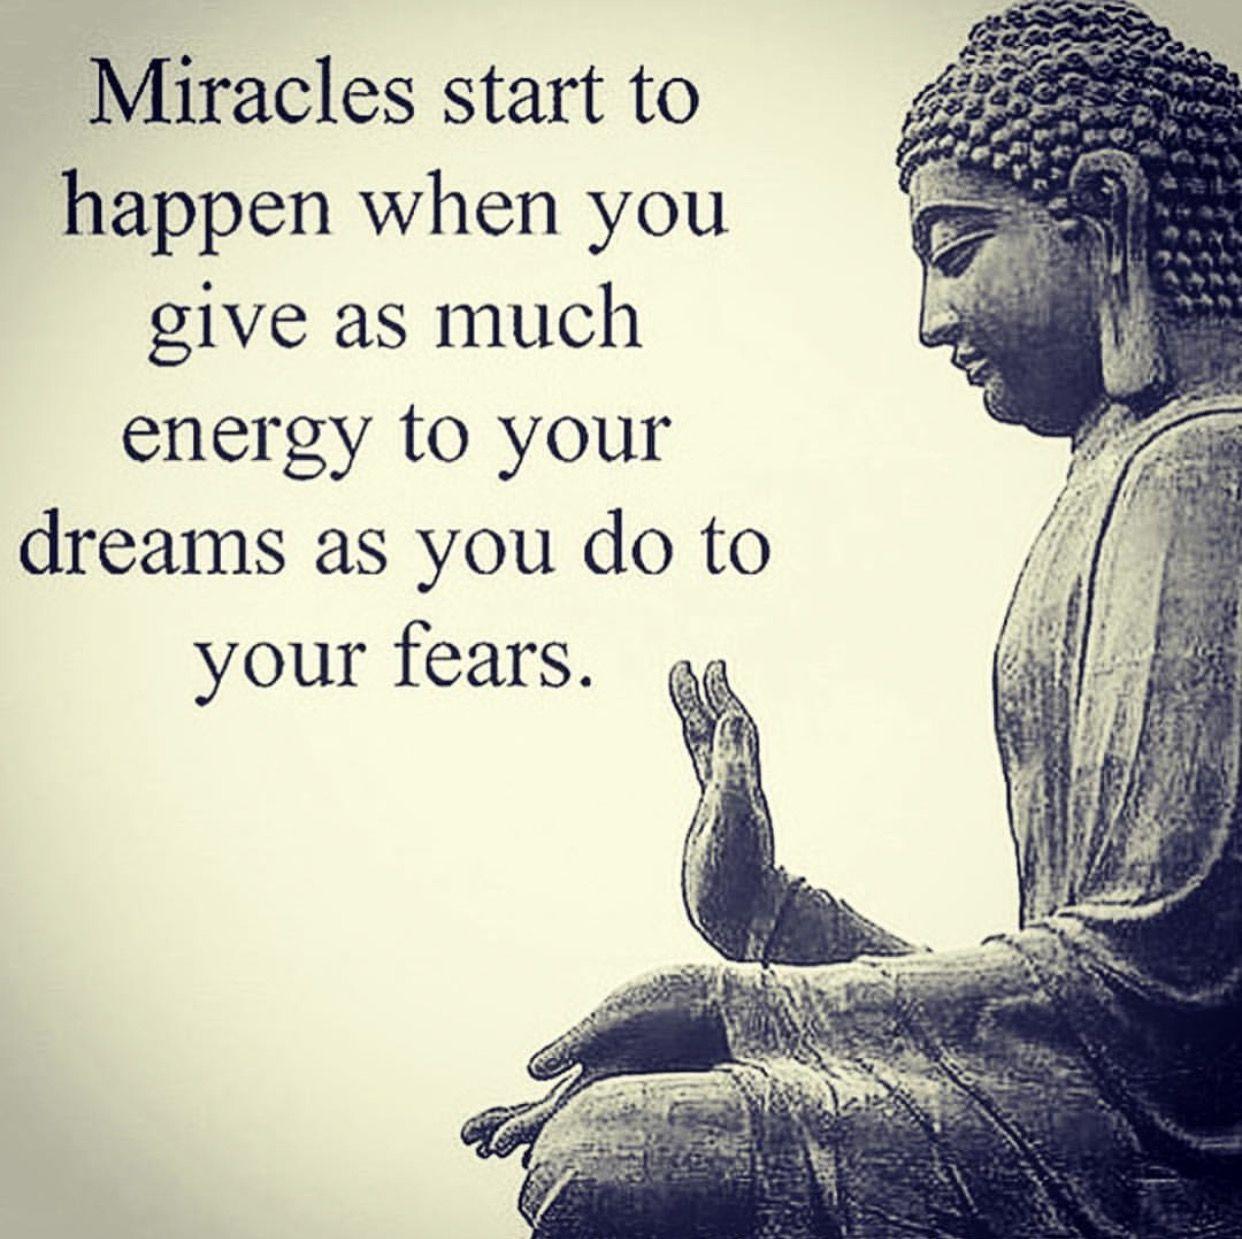 miracles start.jpg